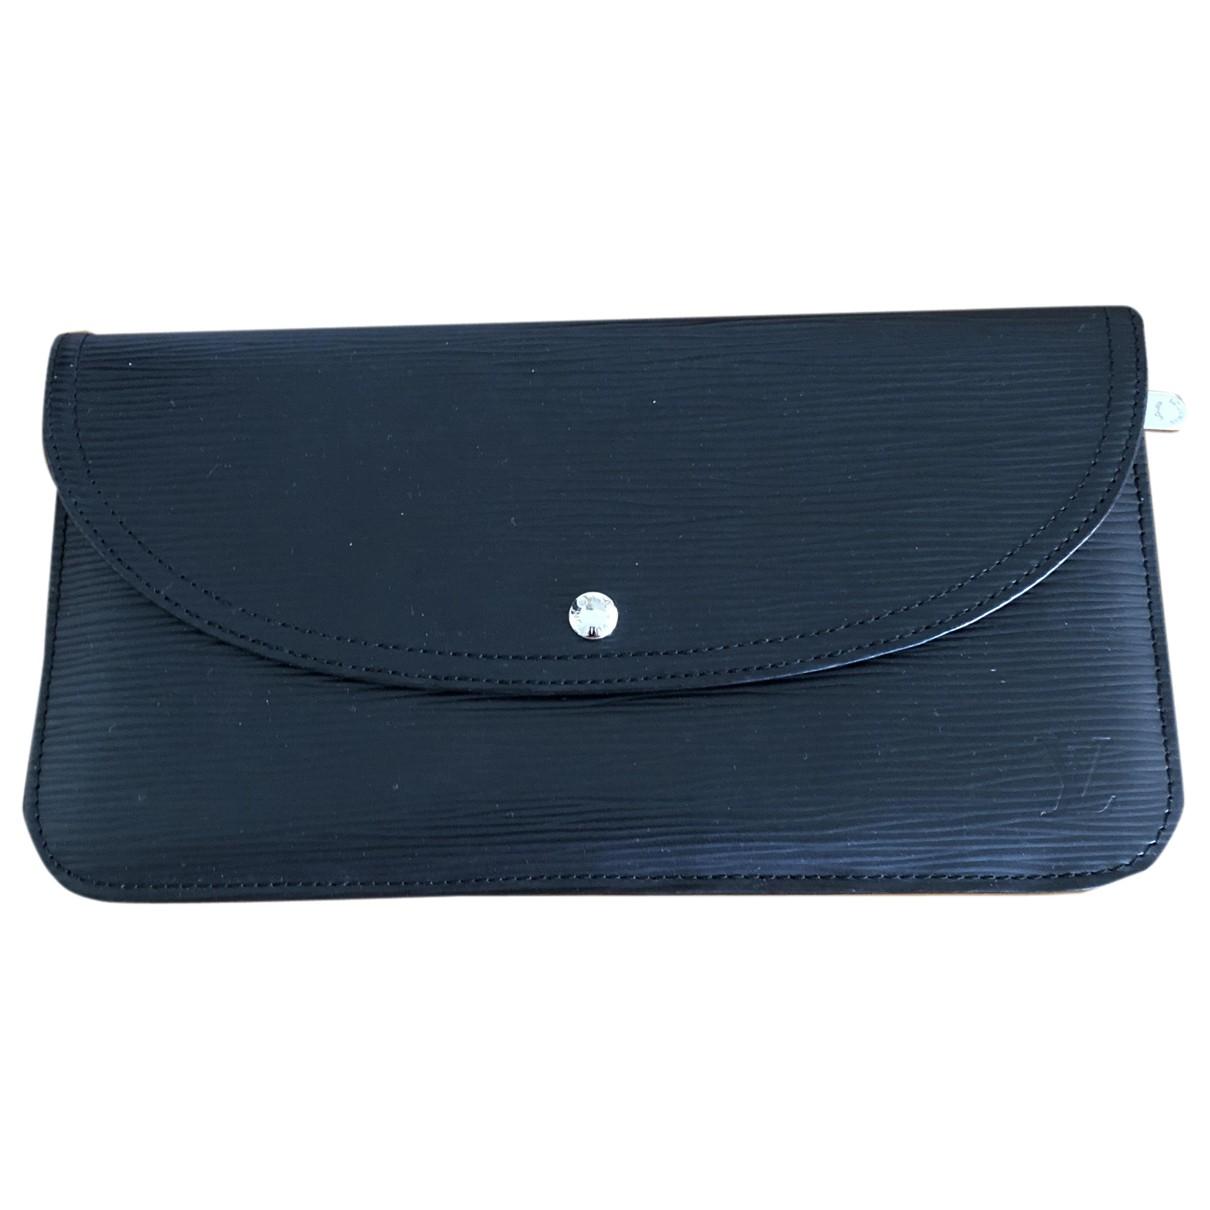 Louis Vuitton \N Black Leather Clutch bag for Women \N